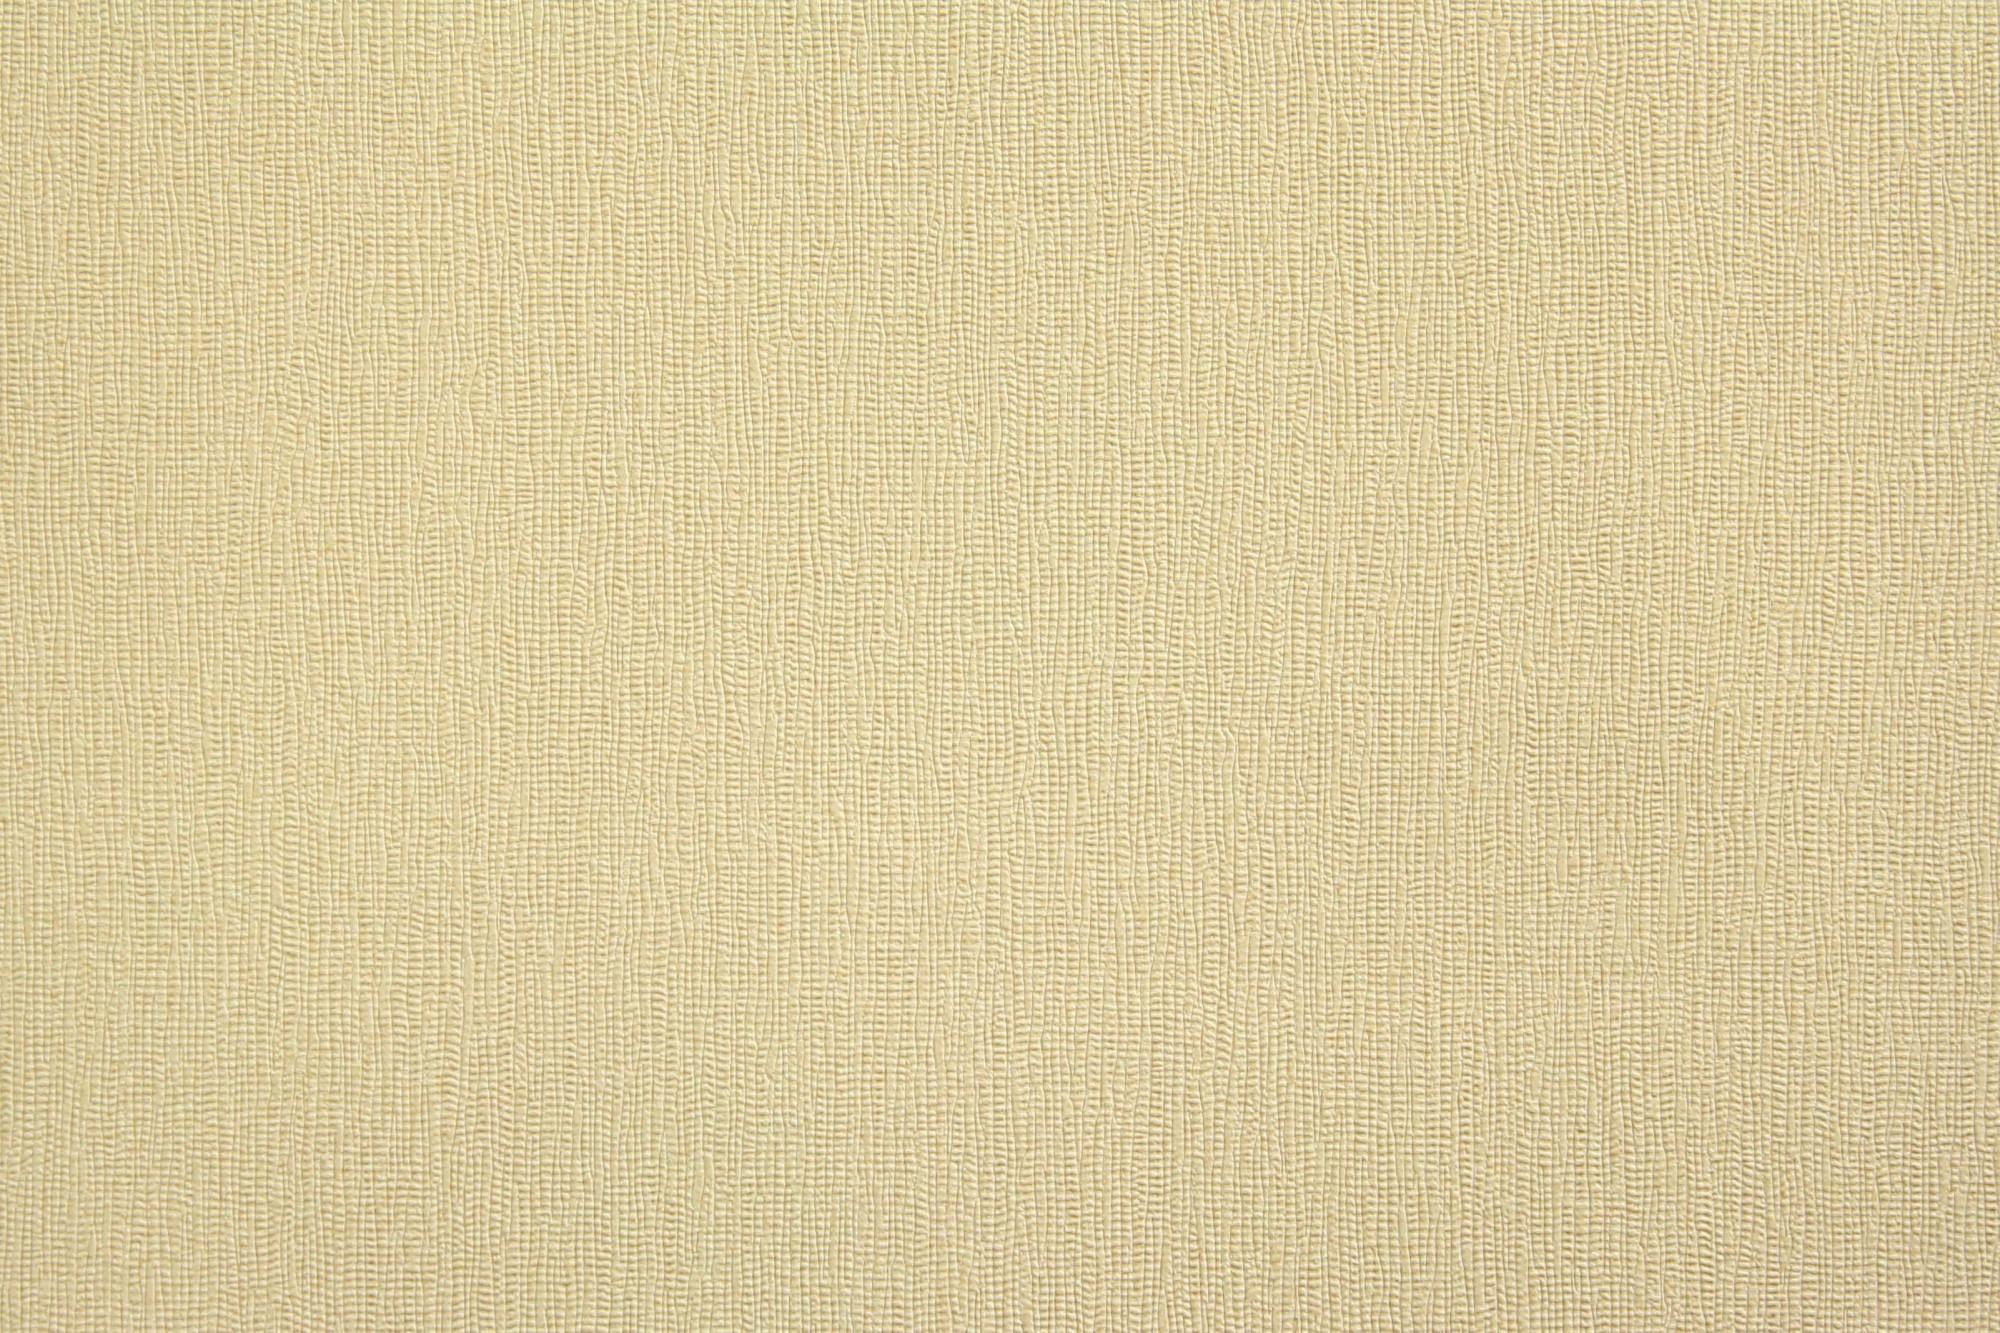 tapete rasch seduction 2014 vliestapete 796346 uni beige ebay. Black Bedroom Furniture Sets. Home Design Ideas